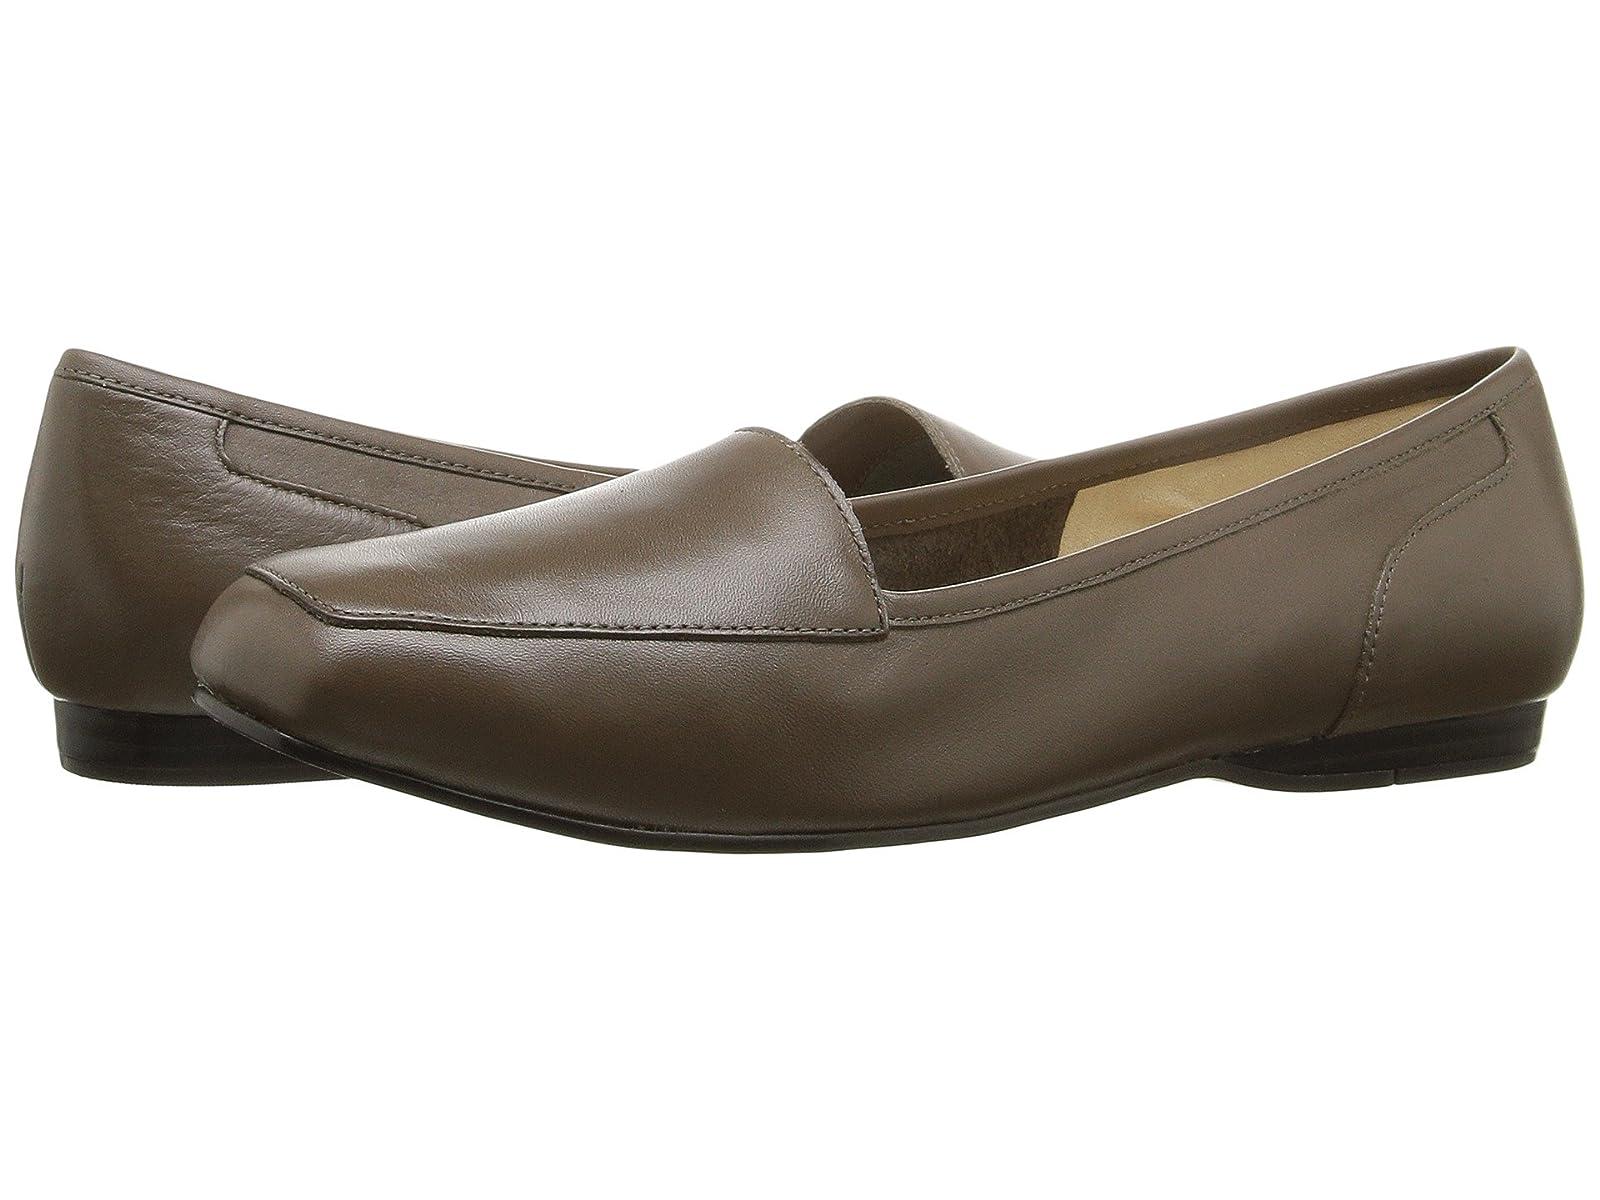 Bandolino LibertyCheap and distinctive eye-catching shoes